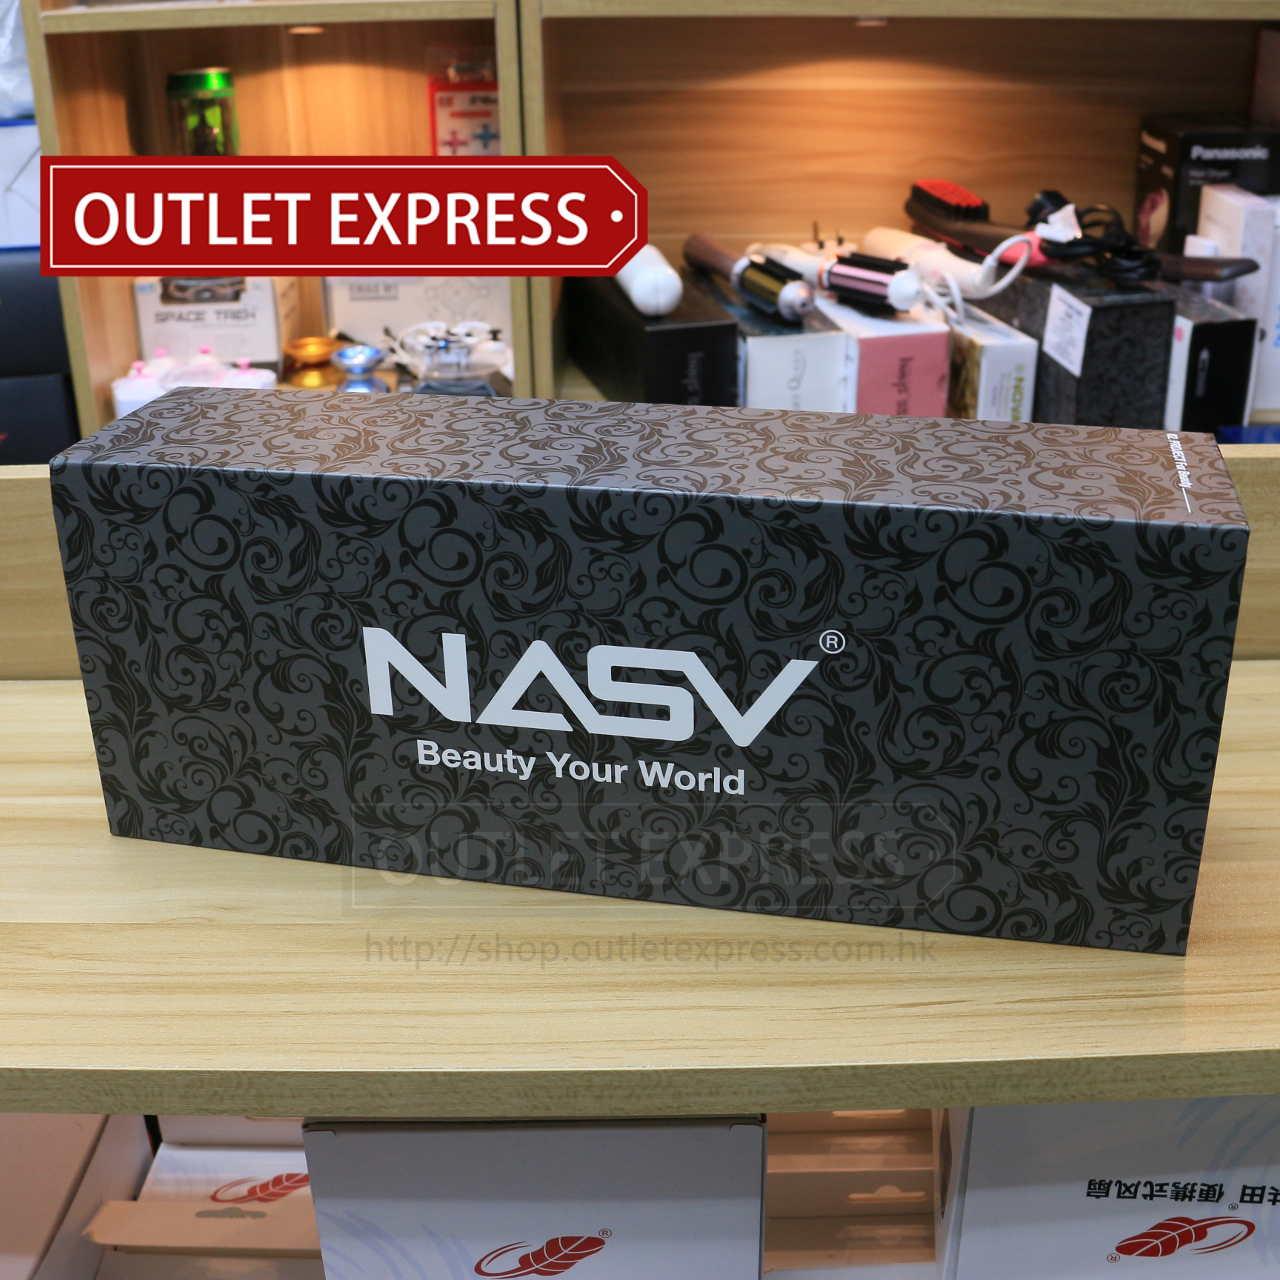 NASV-300 負離子直髮梳 包裝盒 - Outlet Express HK 生活百貨城實拍相片